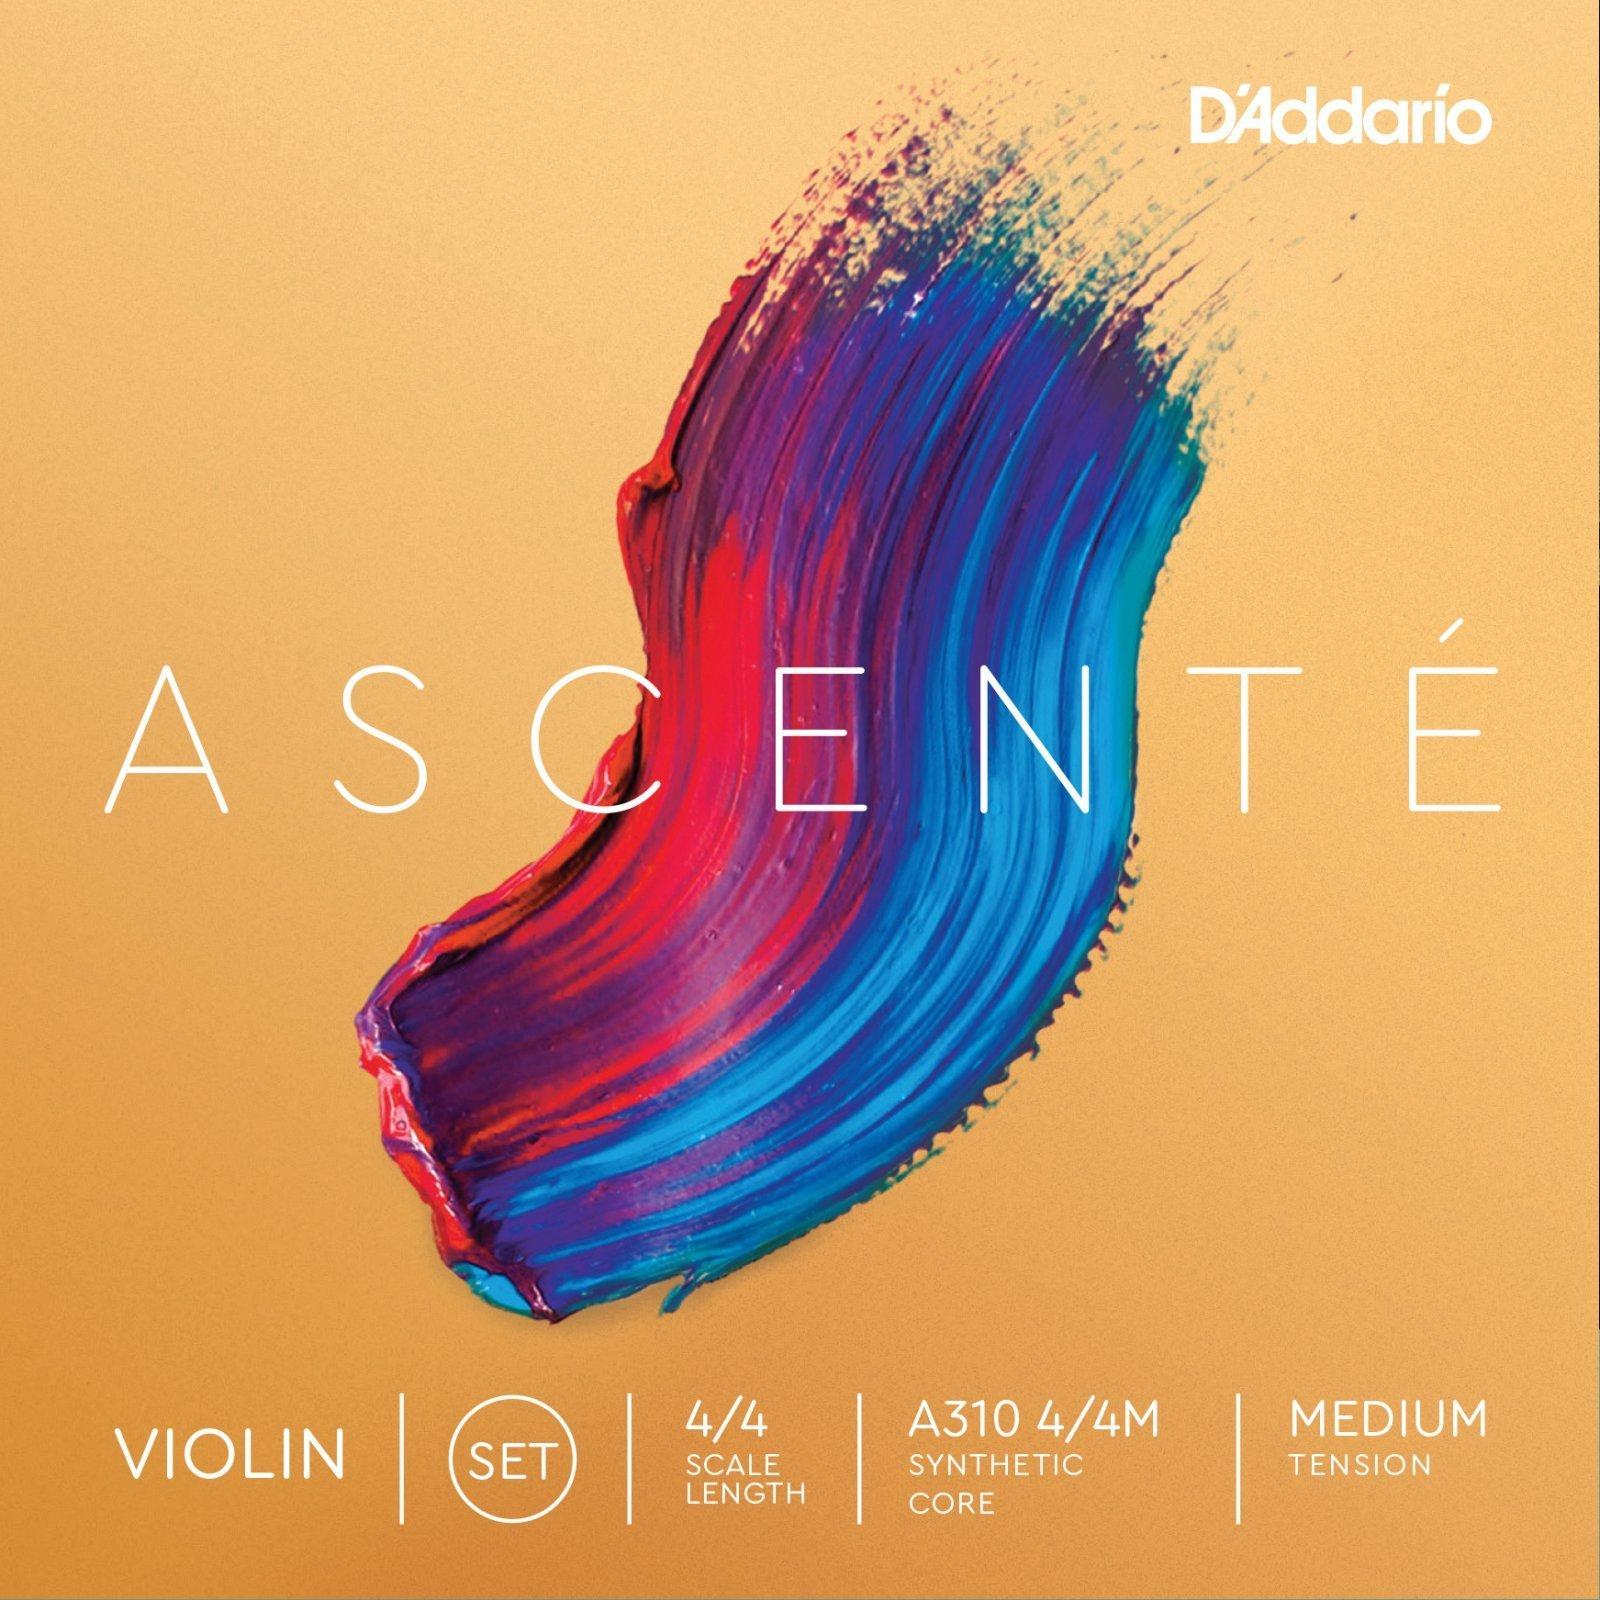 D'addario A310 1/4M Ascente Violin String Set, 1/4 Scale, Medium Tension